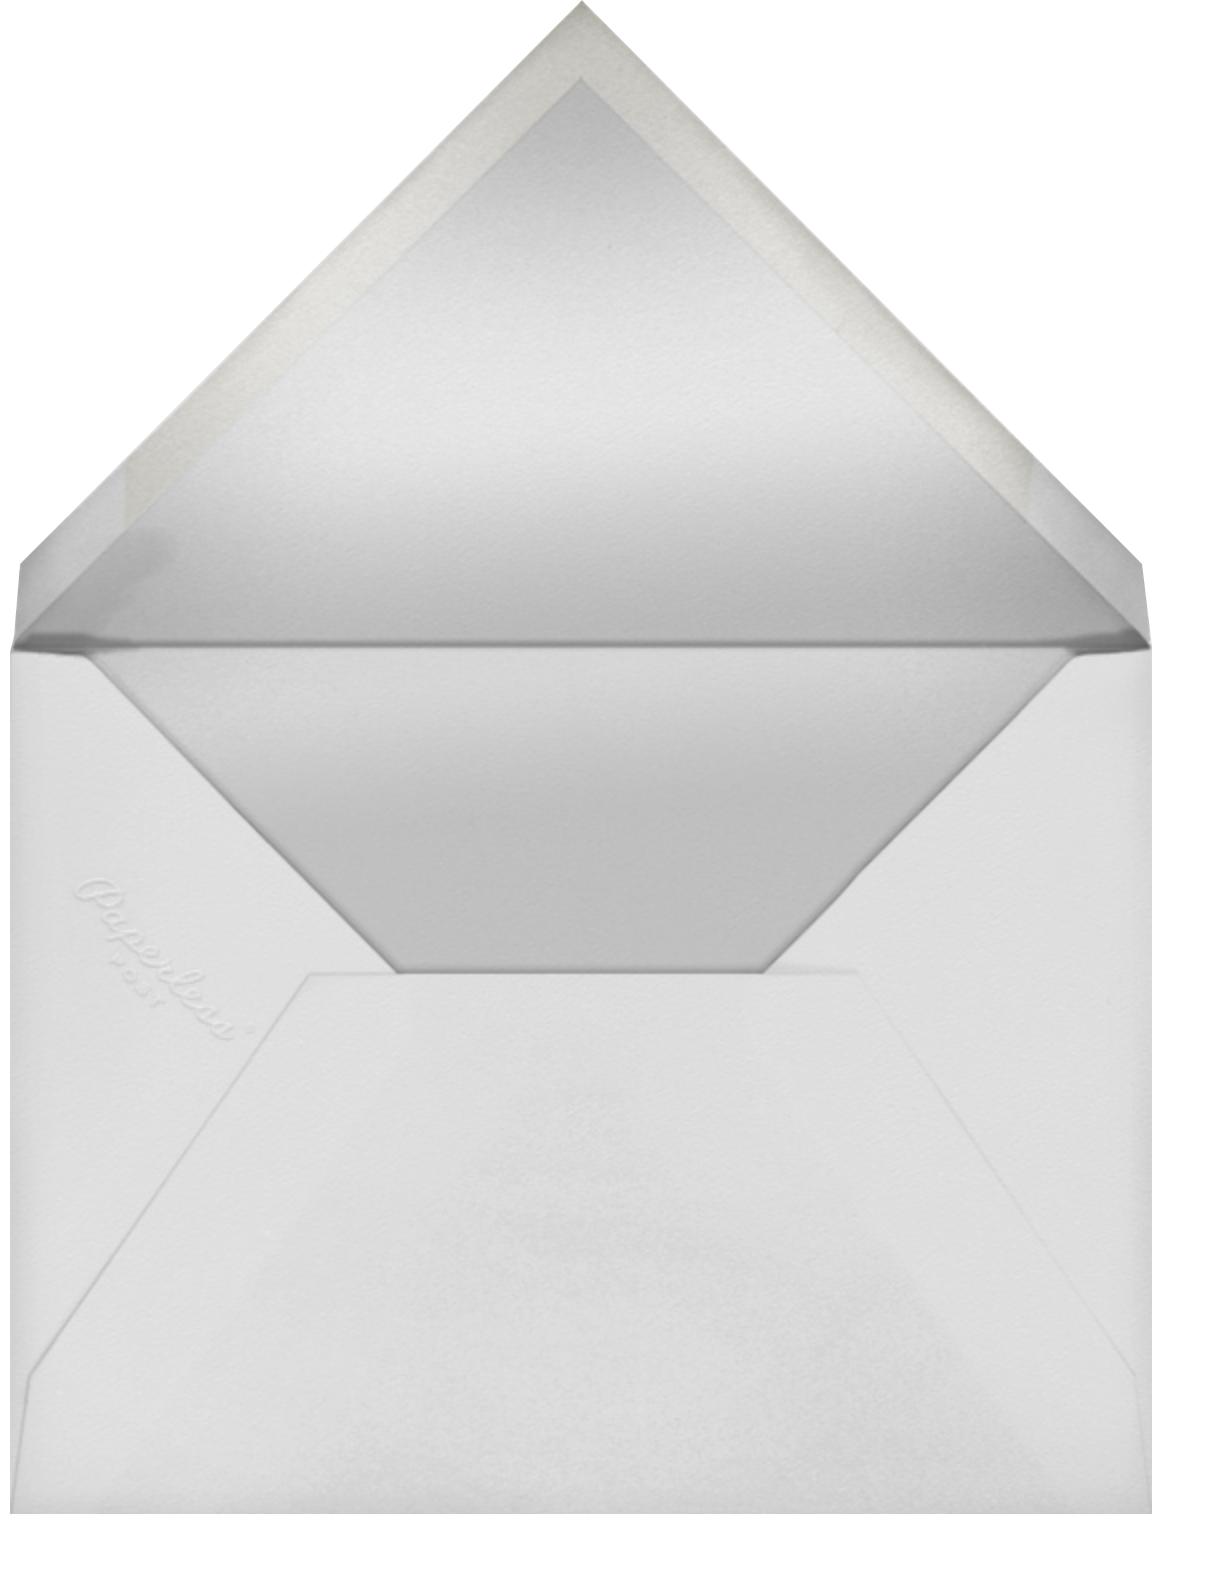 Elizabeth Daylight (Menu) - Liberty - Envelope